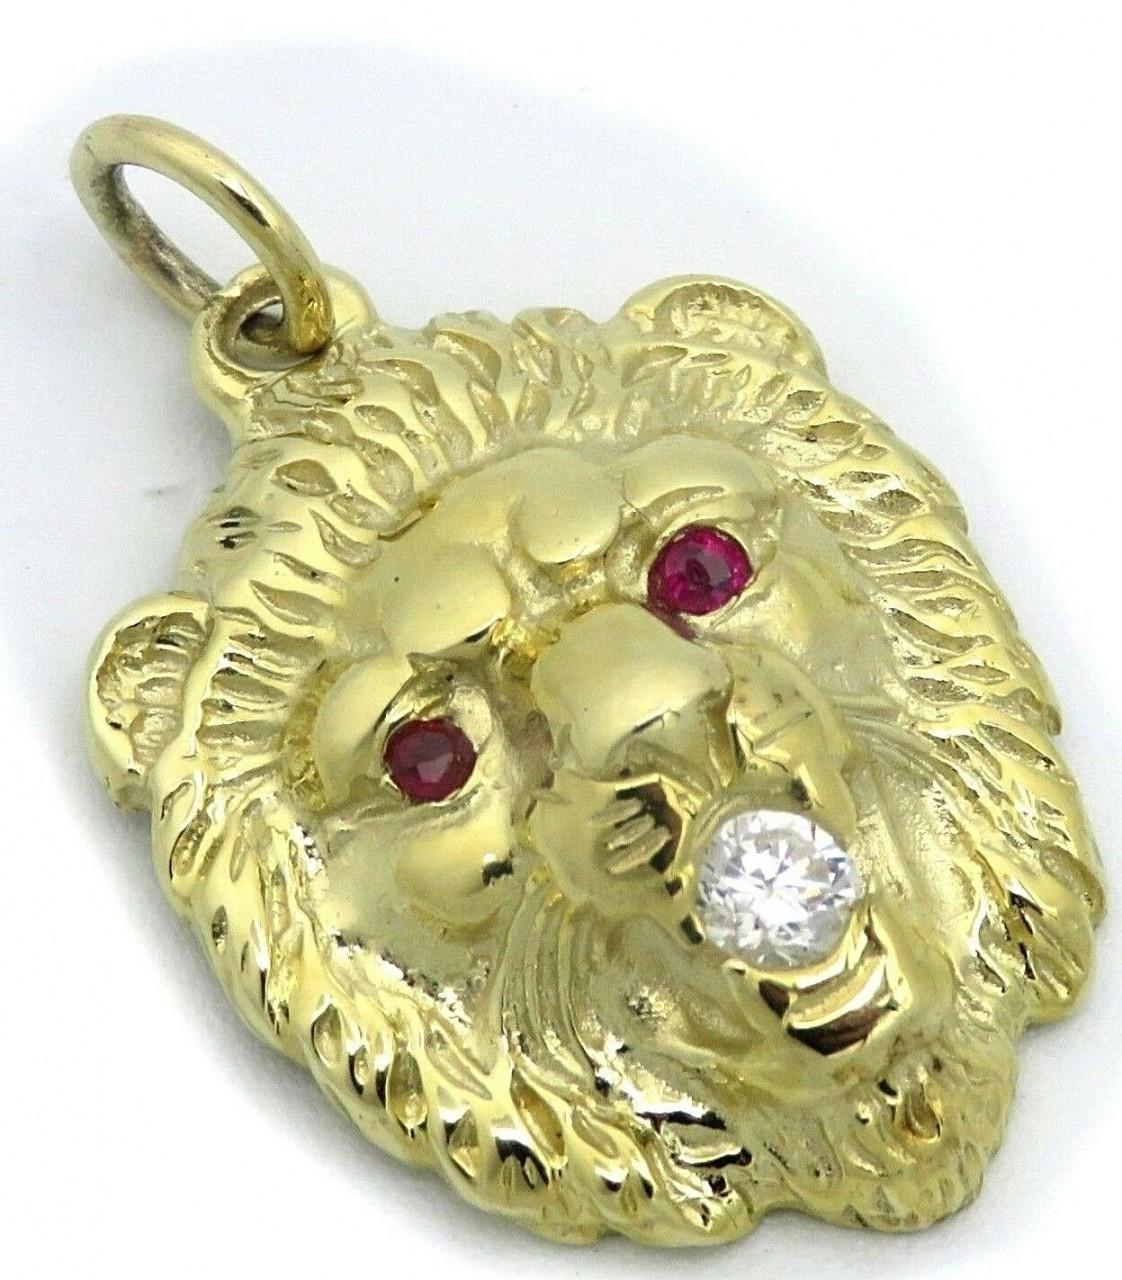 Neu Anhänger Löwe Kopf echt Gold 585 14 karat Rubin Zirkonia Gelbgold massiv